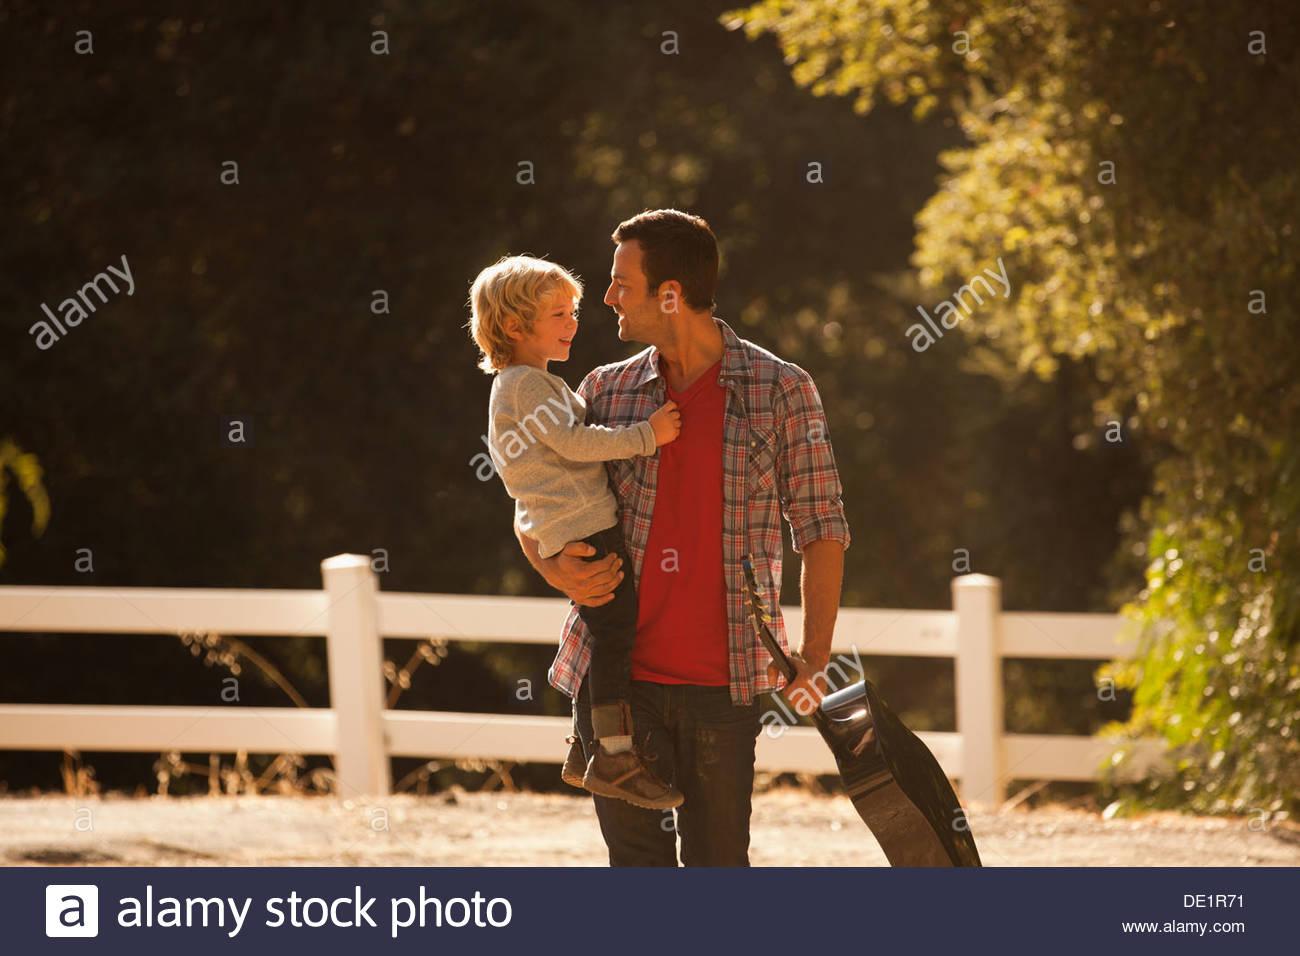 Vater mit Sohn und Gitarre auf Feldweg Stockbild